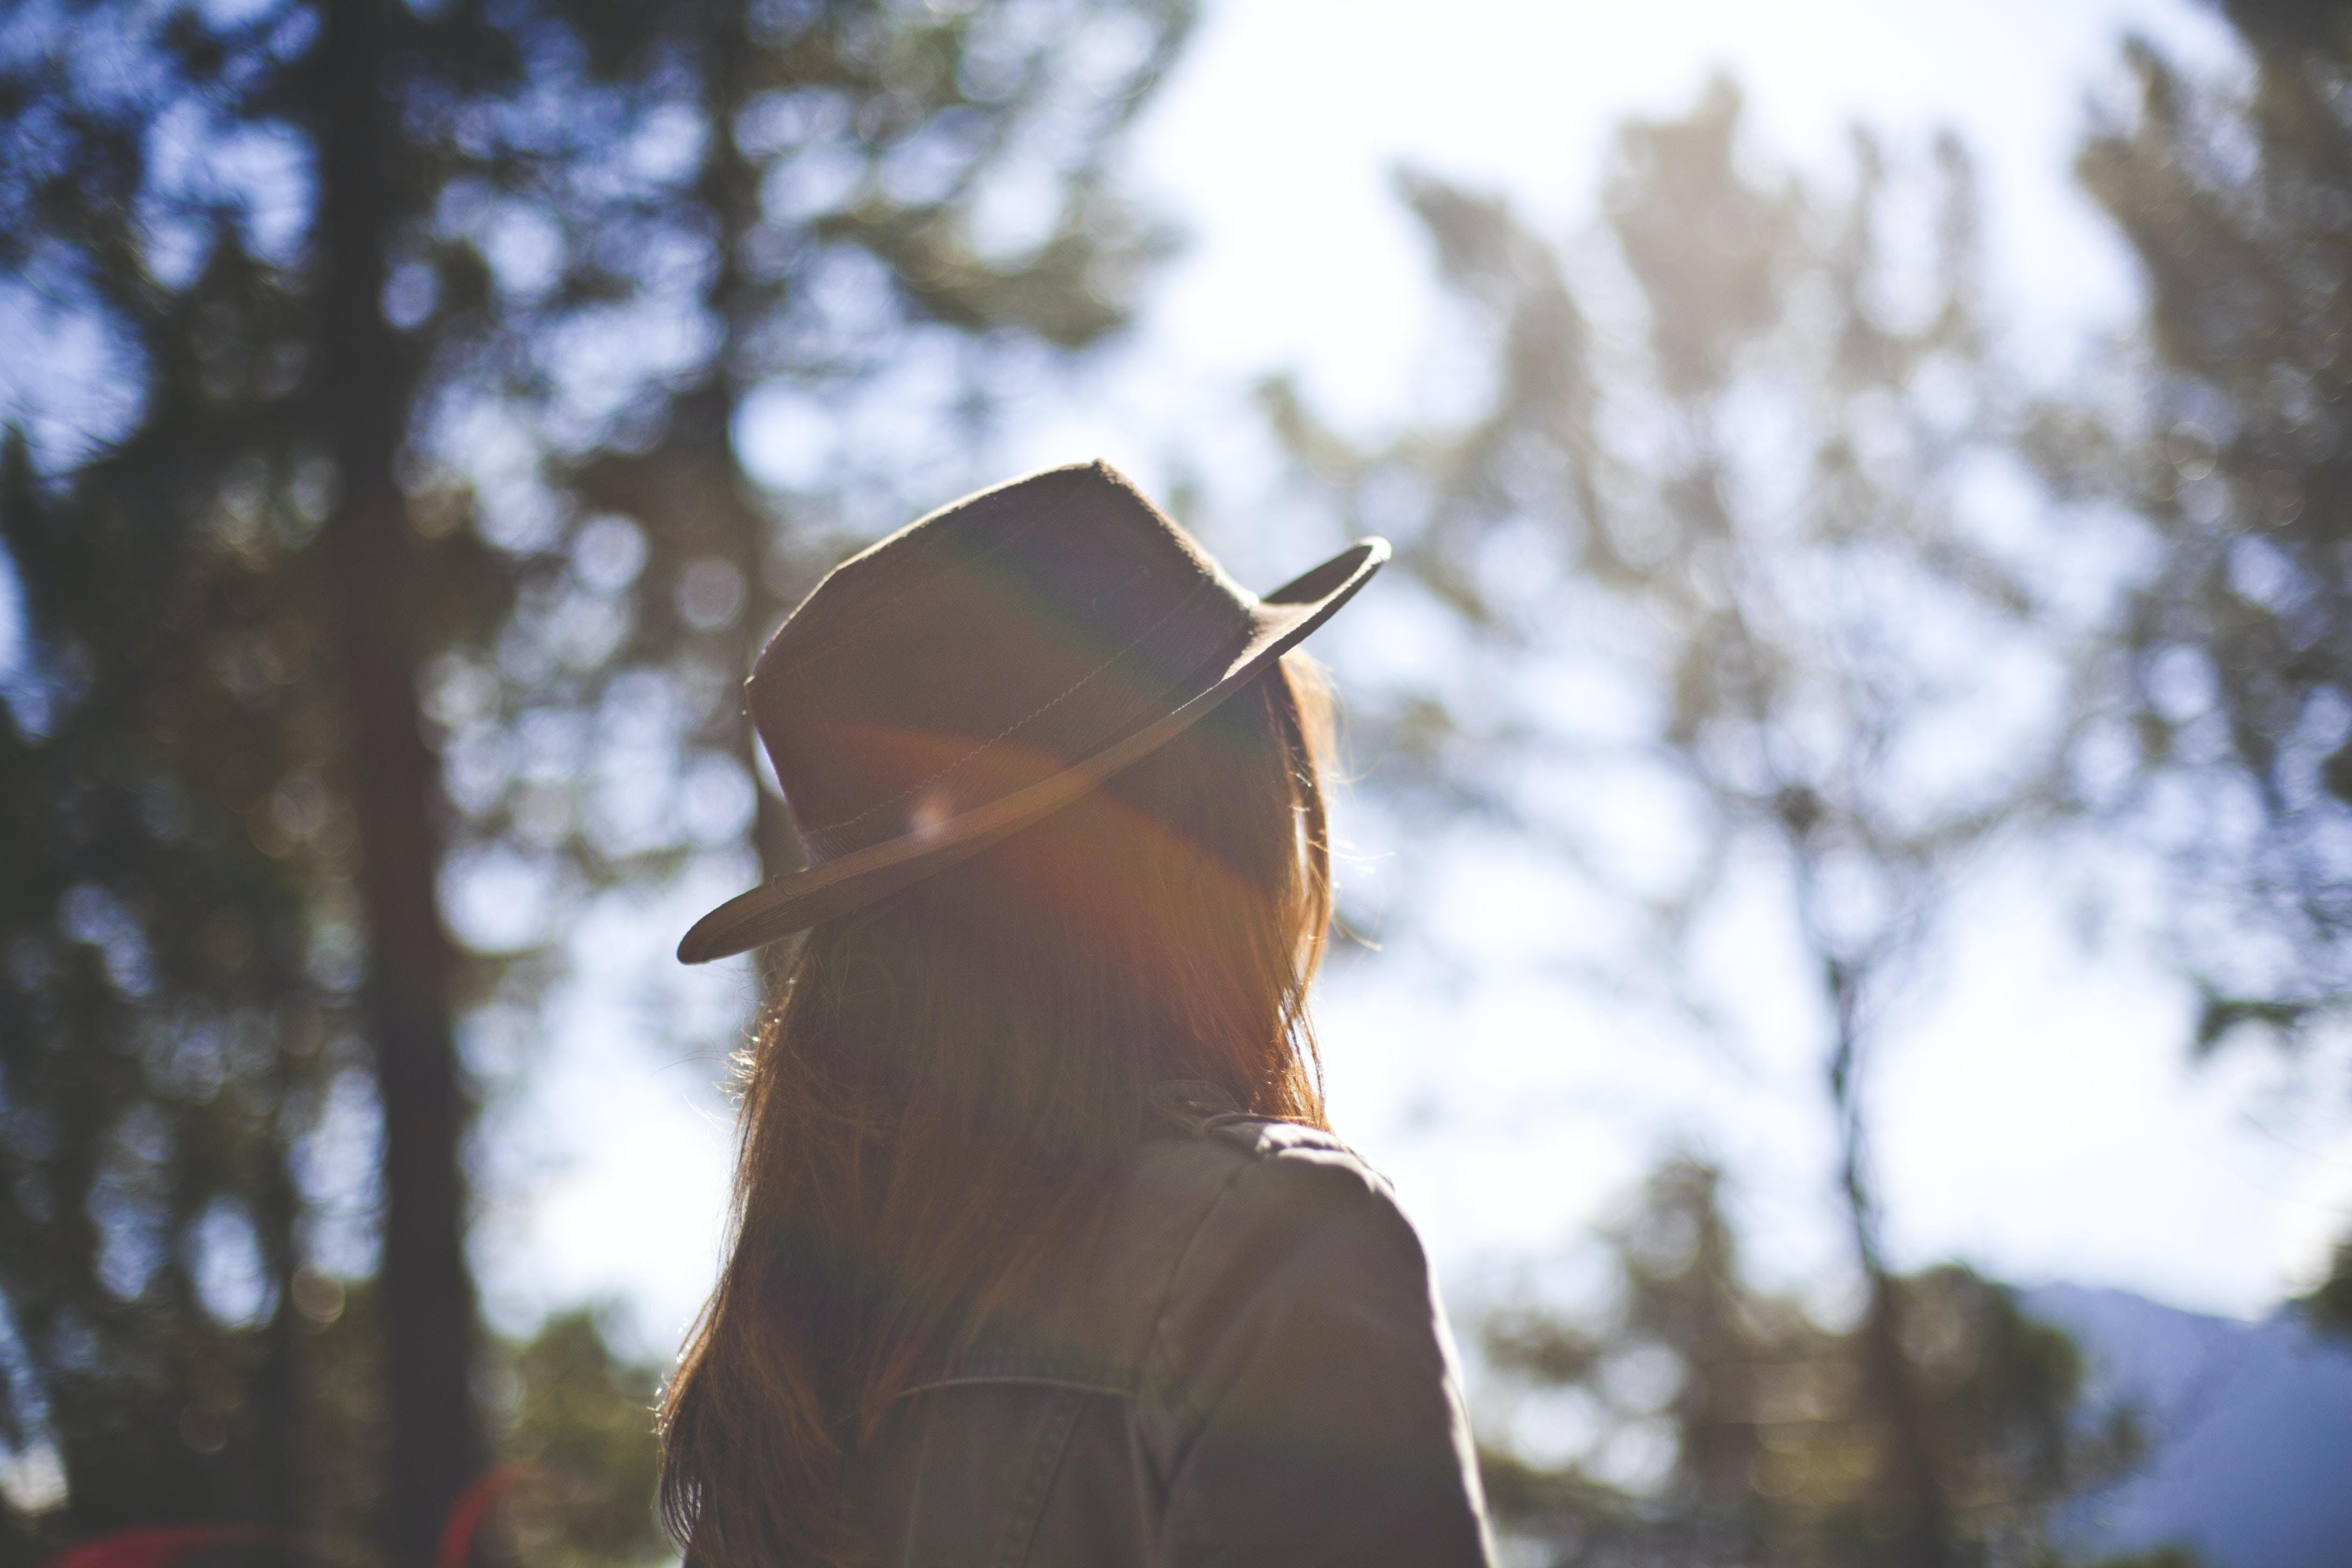 woman wearing hat standing facing tree